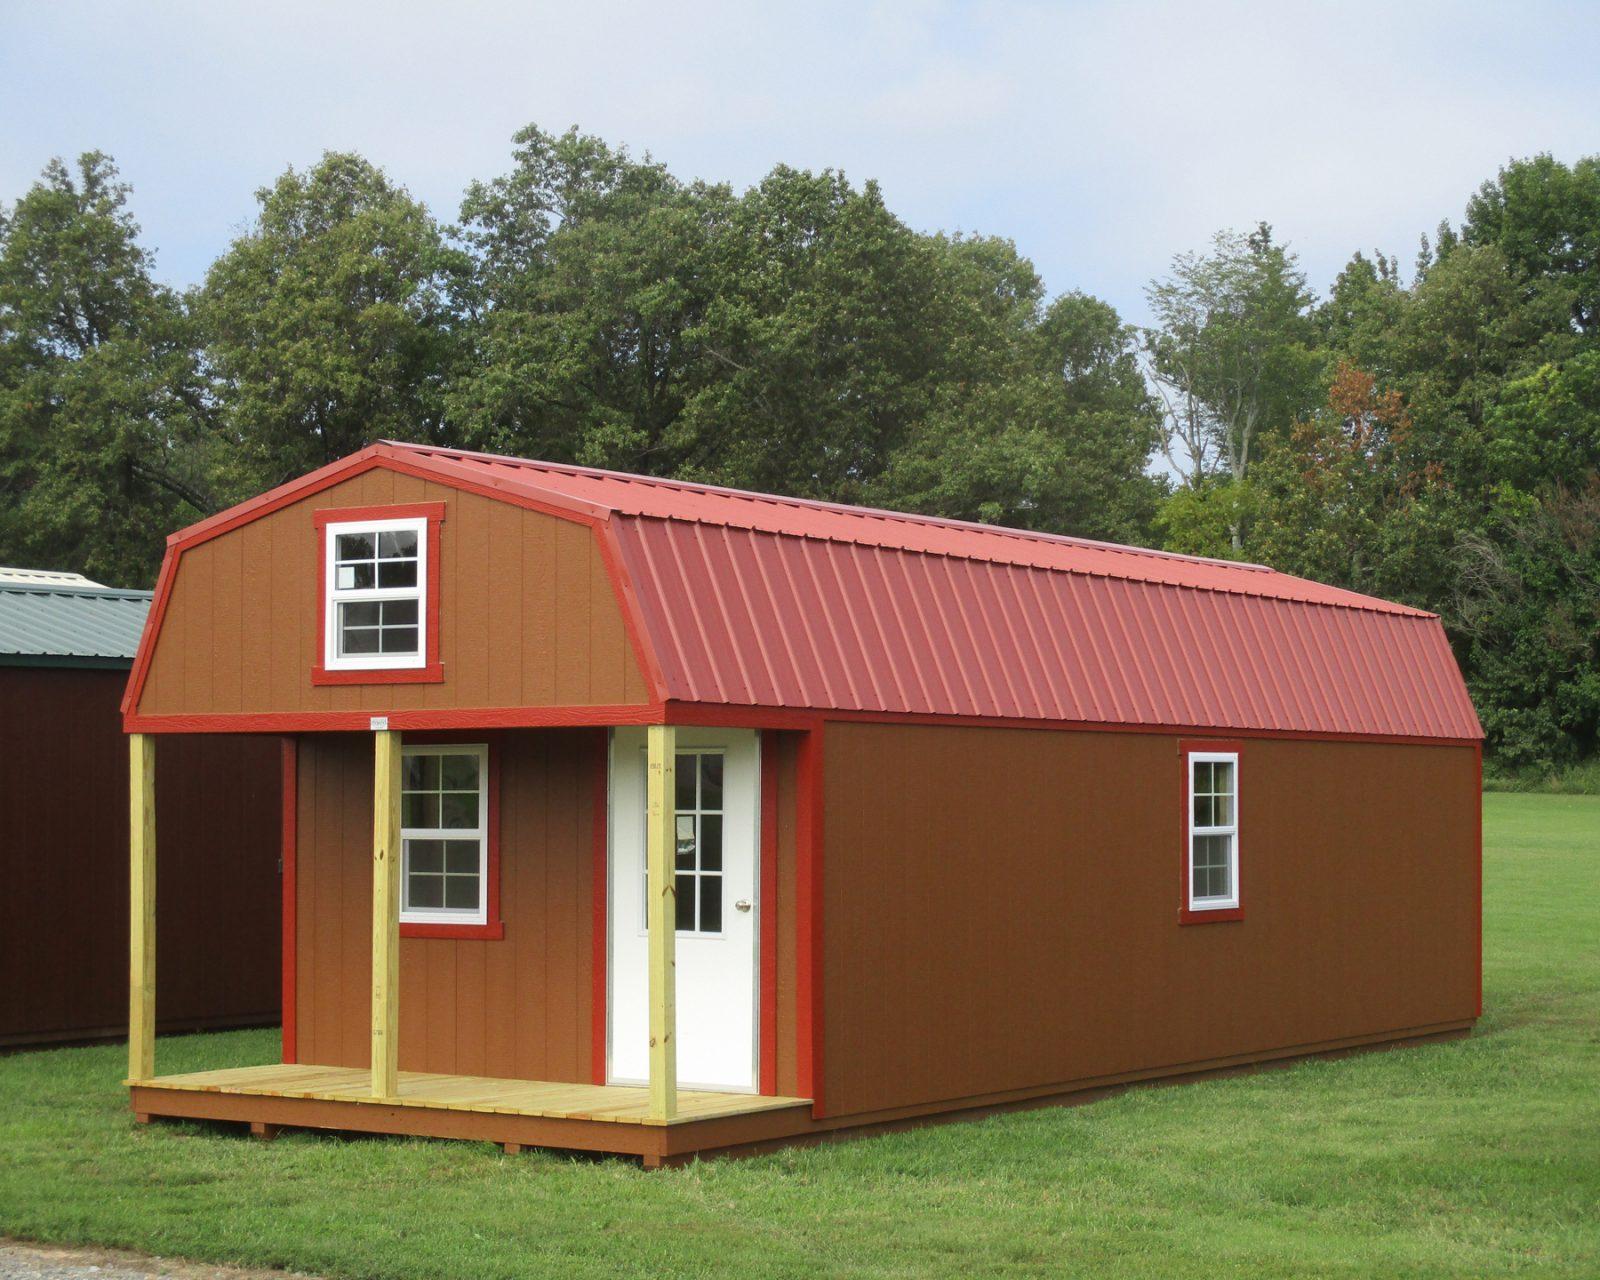 blytheville arkansas cabin